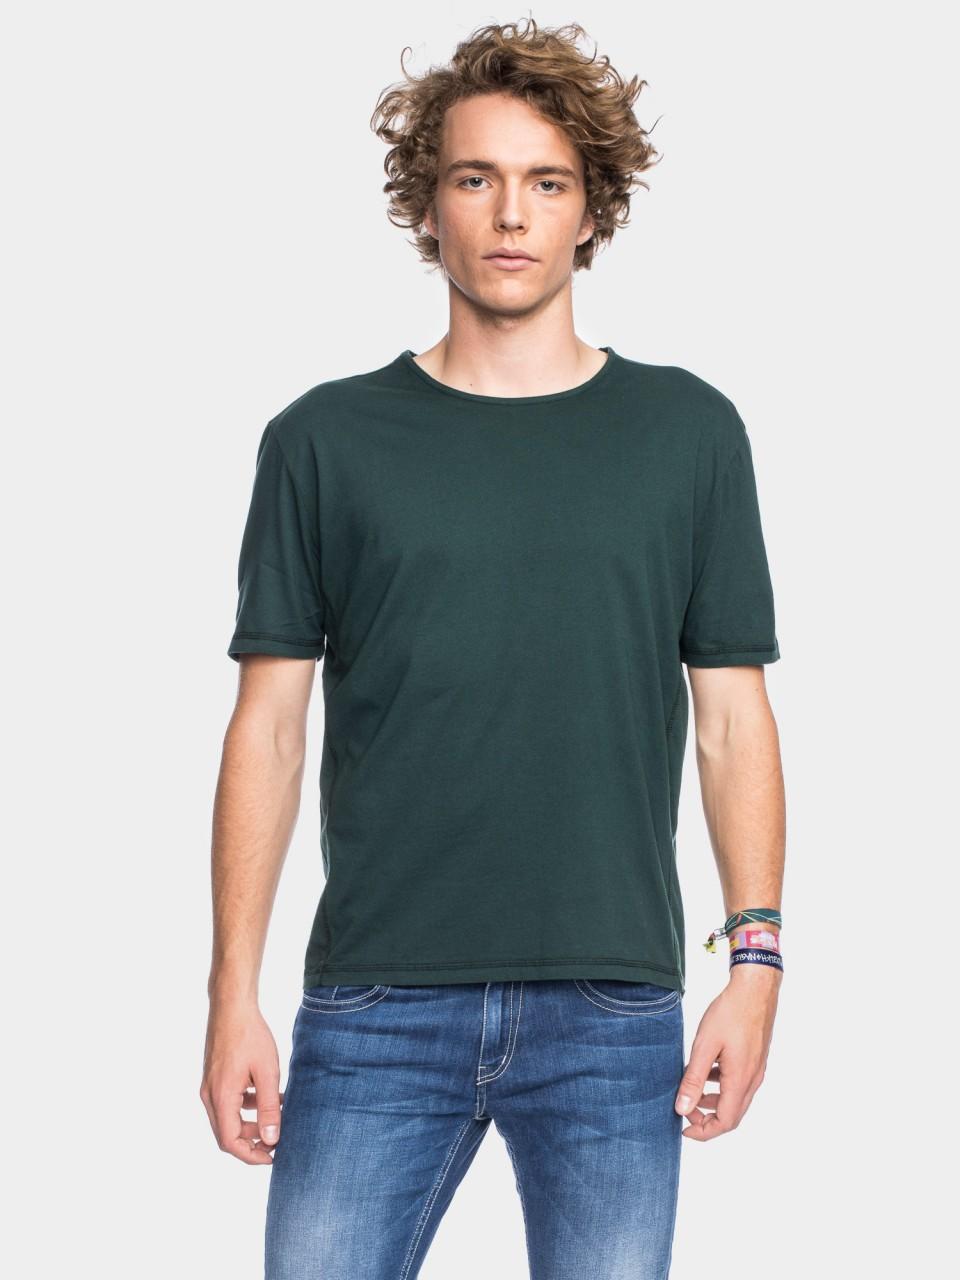 T-Shirt Herbert OC DGRN